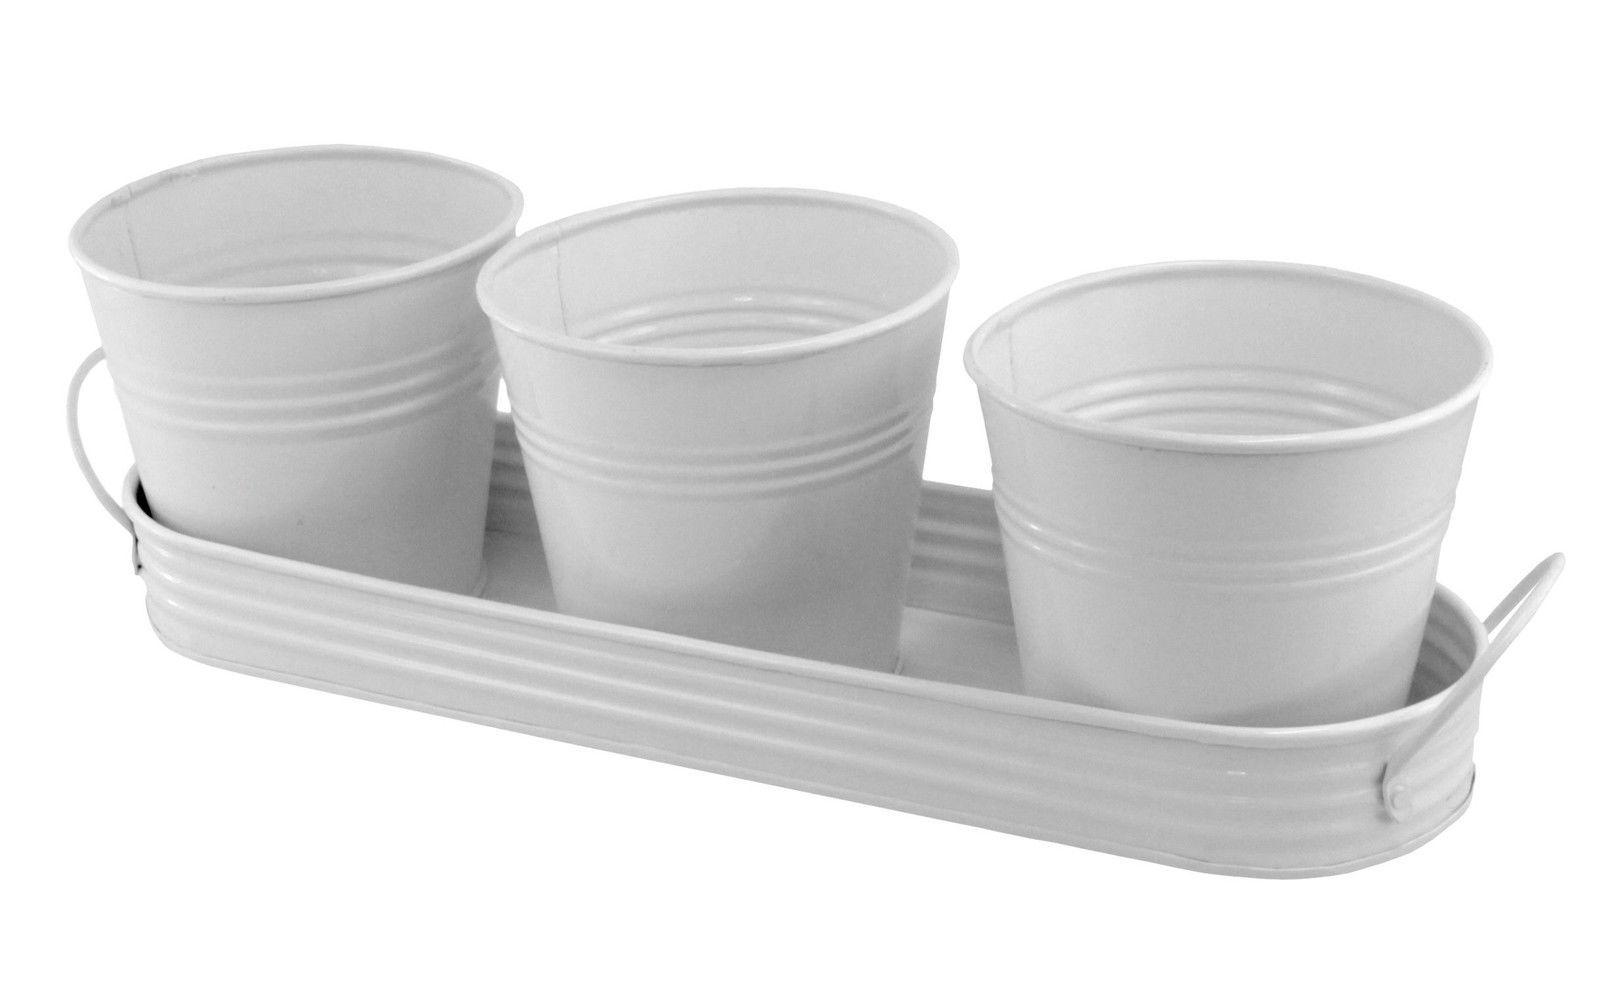 PLAID 3 Metal Planting Pots In Tray - White -   24 white garden pots ideas